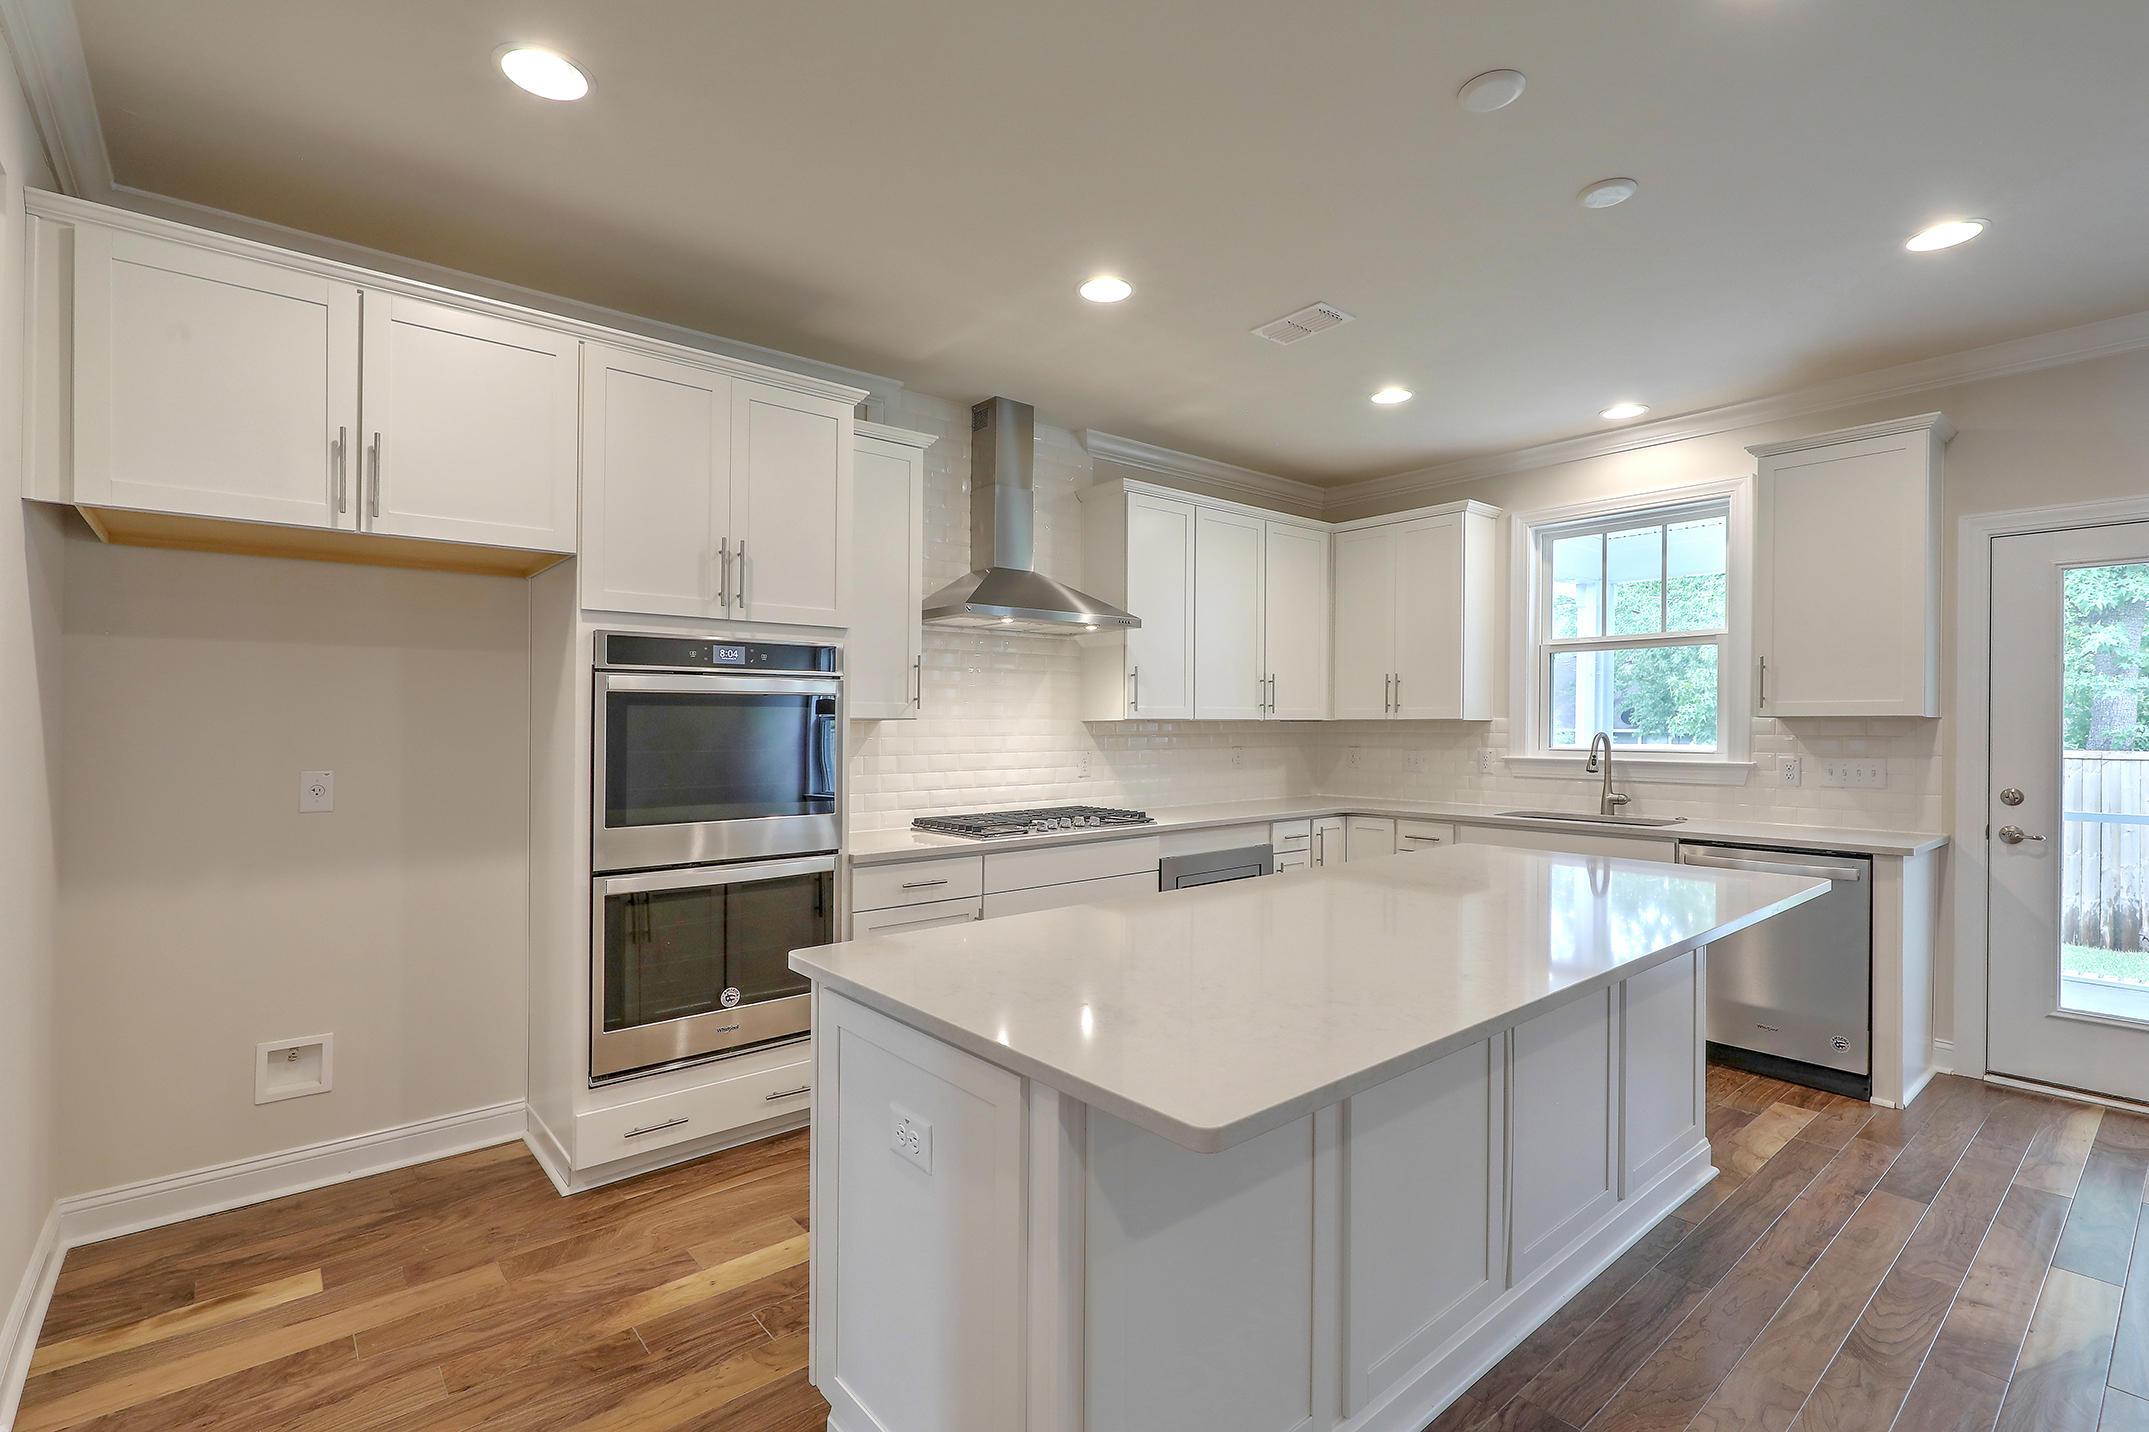 Bentley Park Homes For Sale - 1277 Gannett, Mount Pleasant, SC - 20